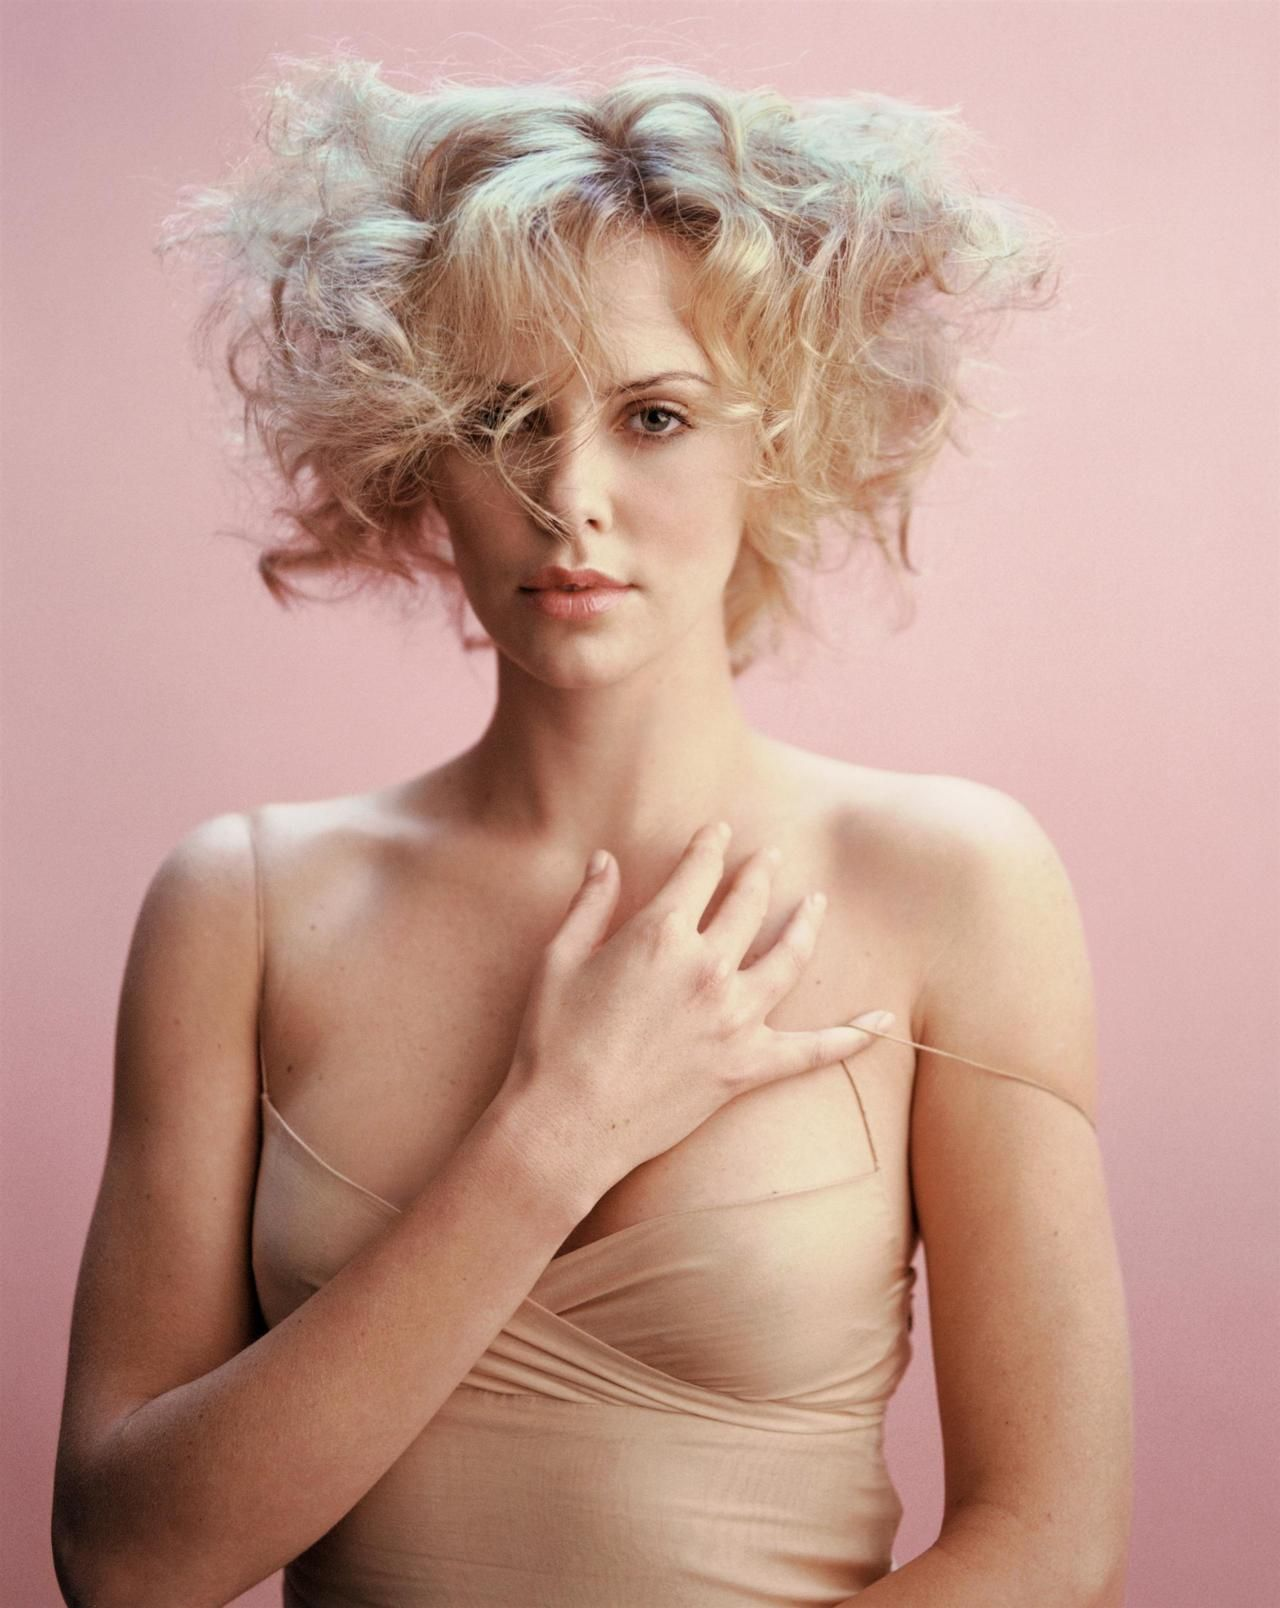 nude on nude, on nude. one of my very favorite leading ladies